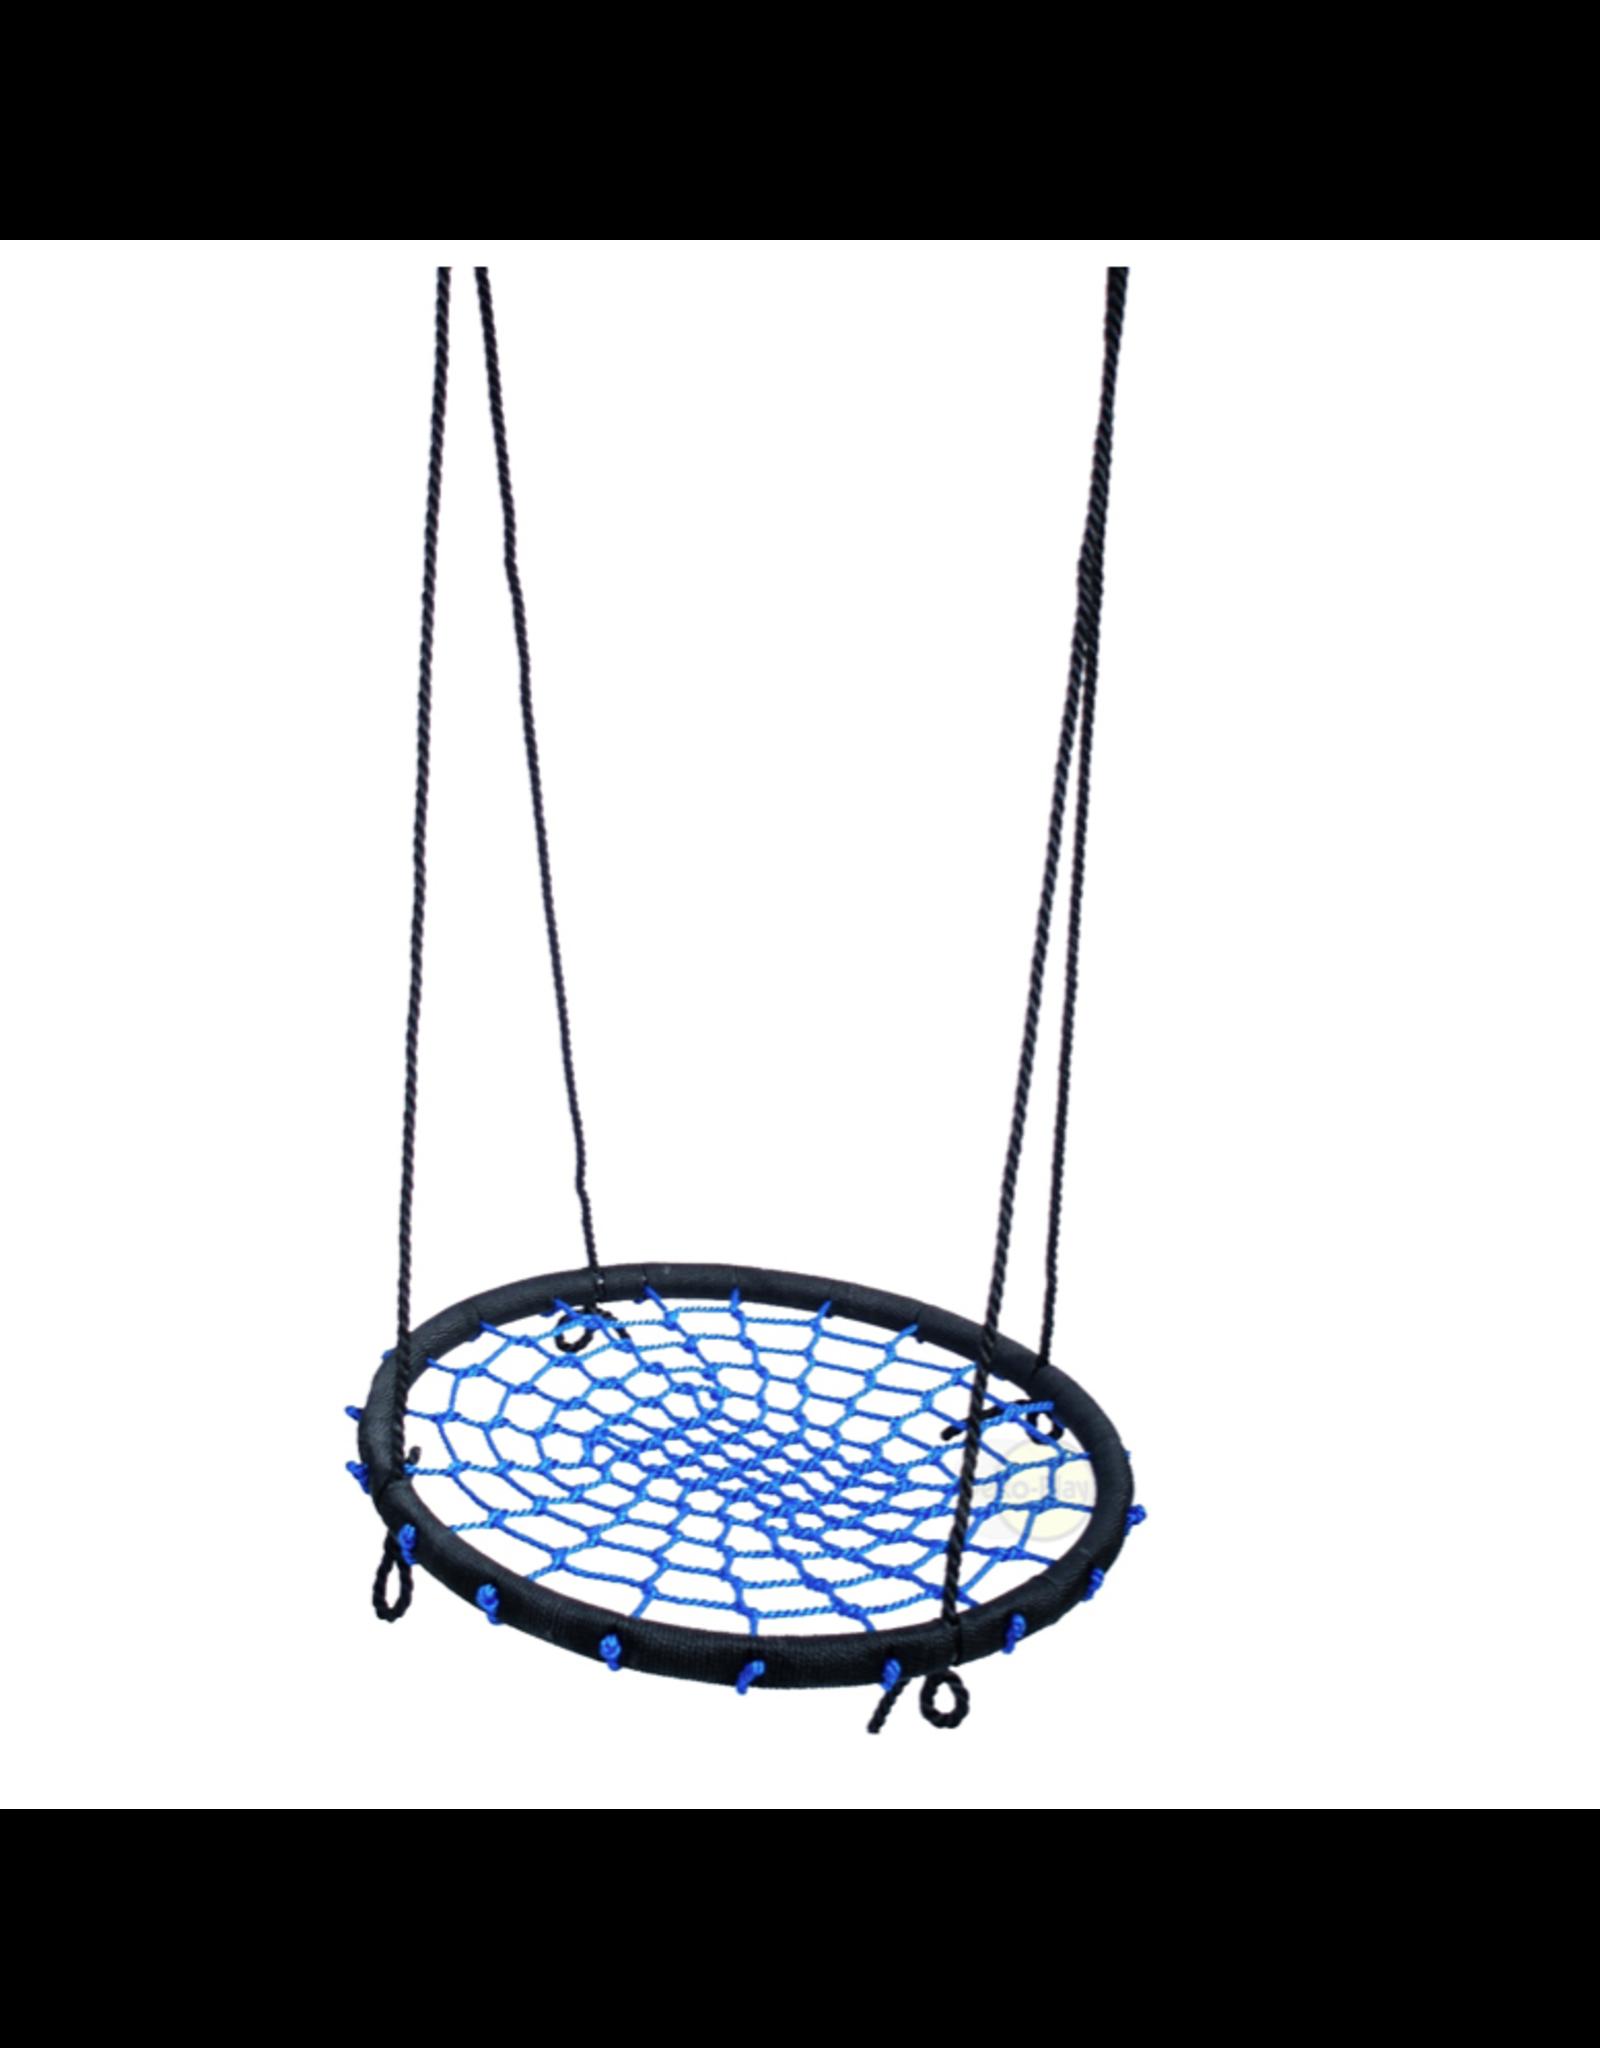 Déko-Play Déko-Play Nest Swing, black/blue 100cm